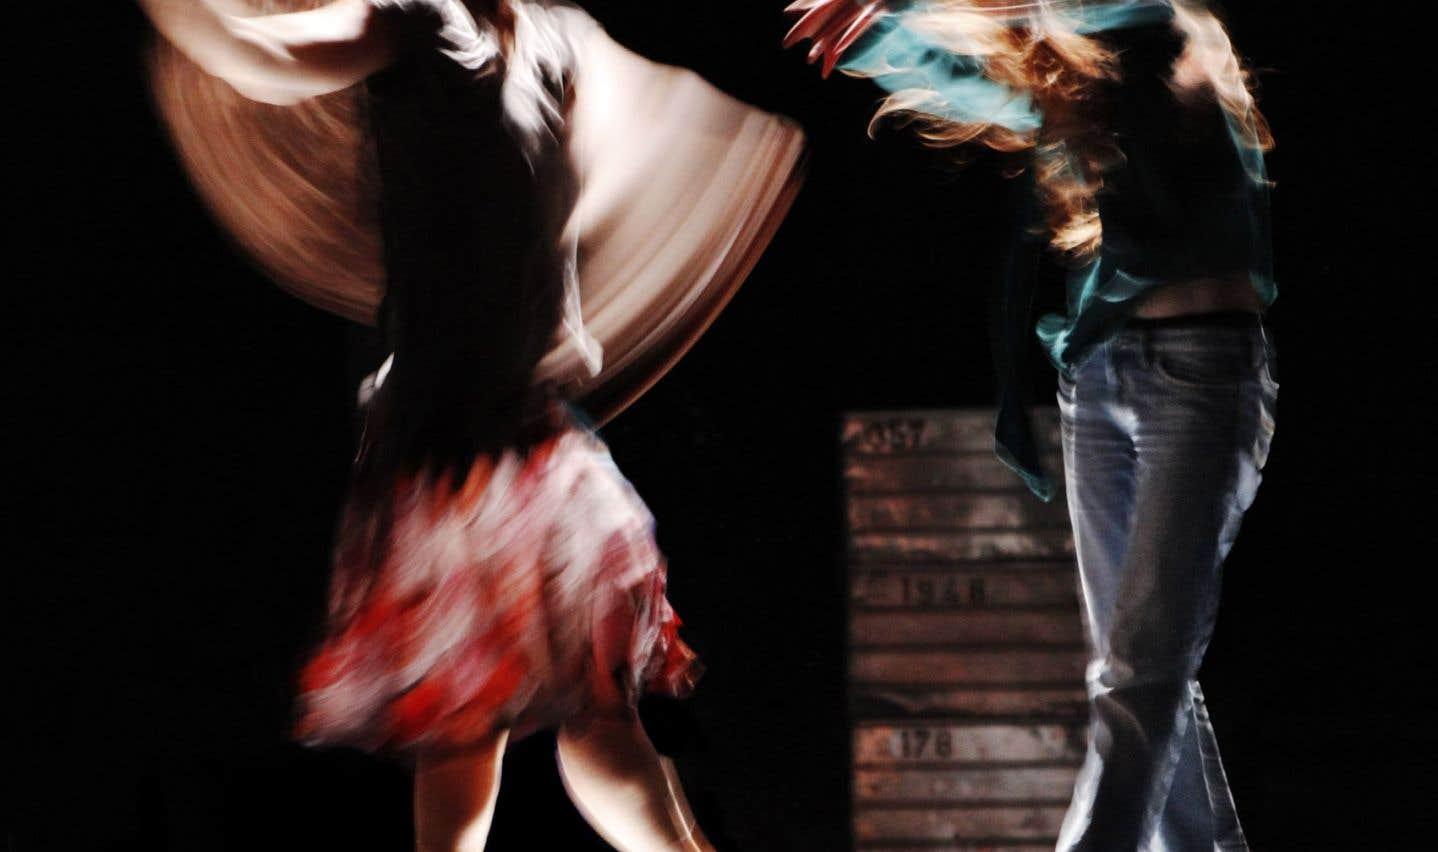 La danse-théâtre Trust, en mai 2011